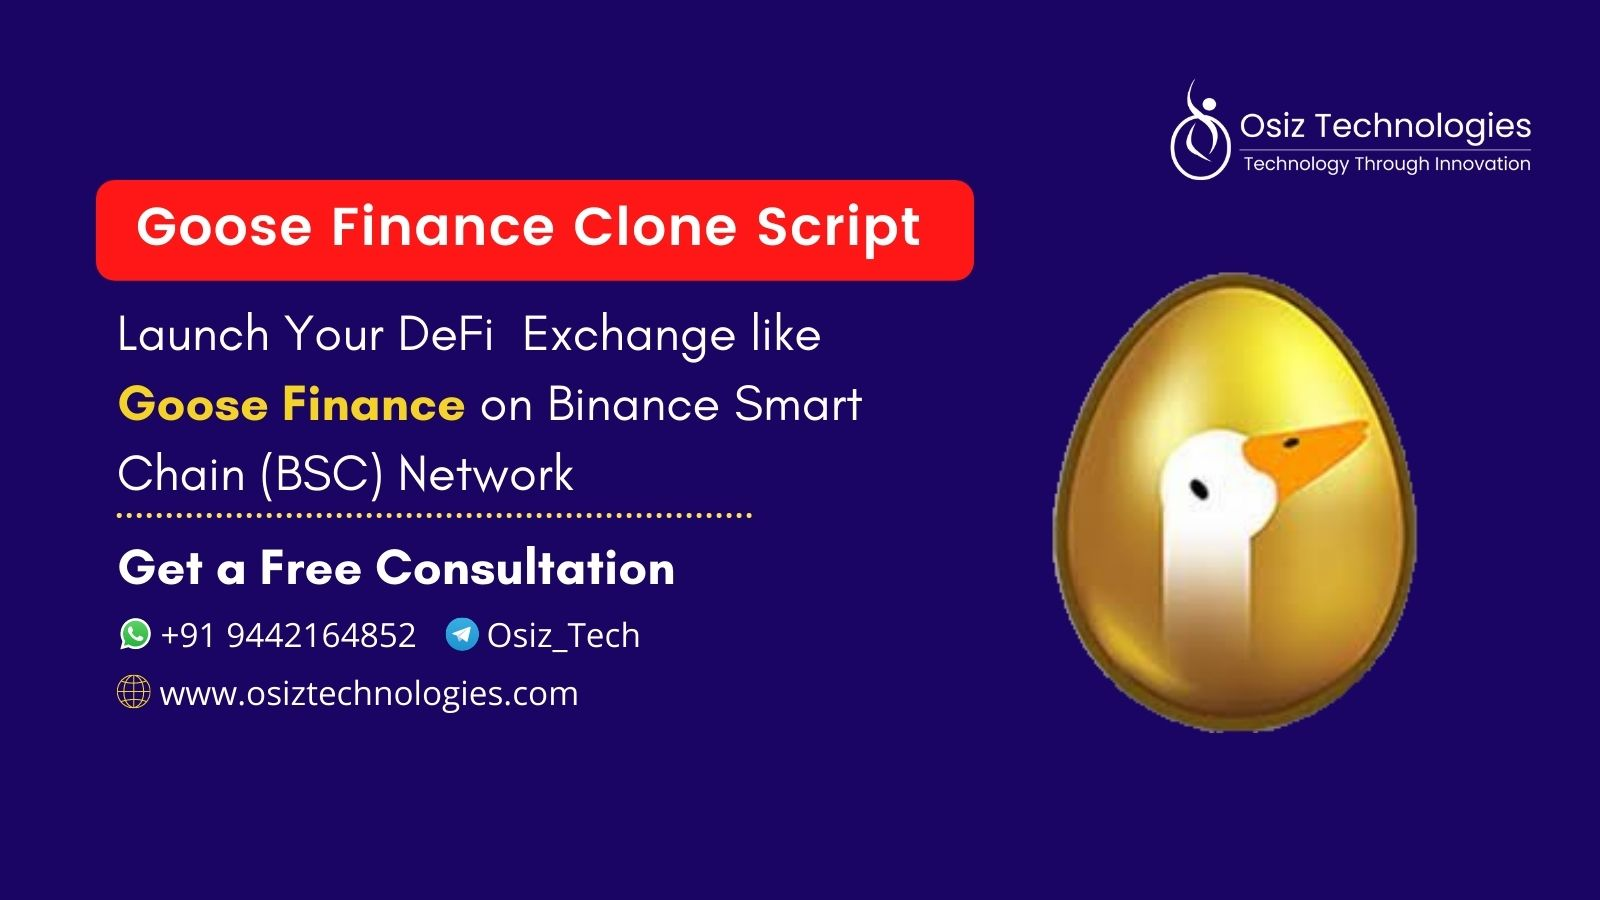 Goose Finance Clone Script - To Build DeFi Exchange Like Goose Finance On Binance Smart Chain (BSC)